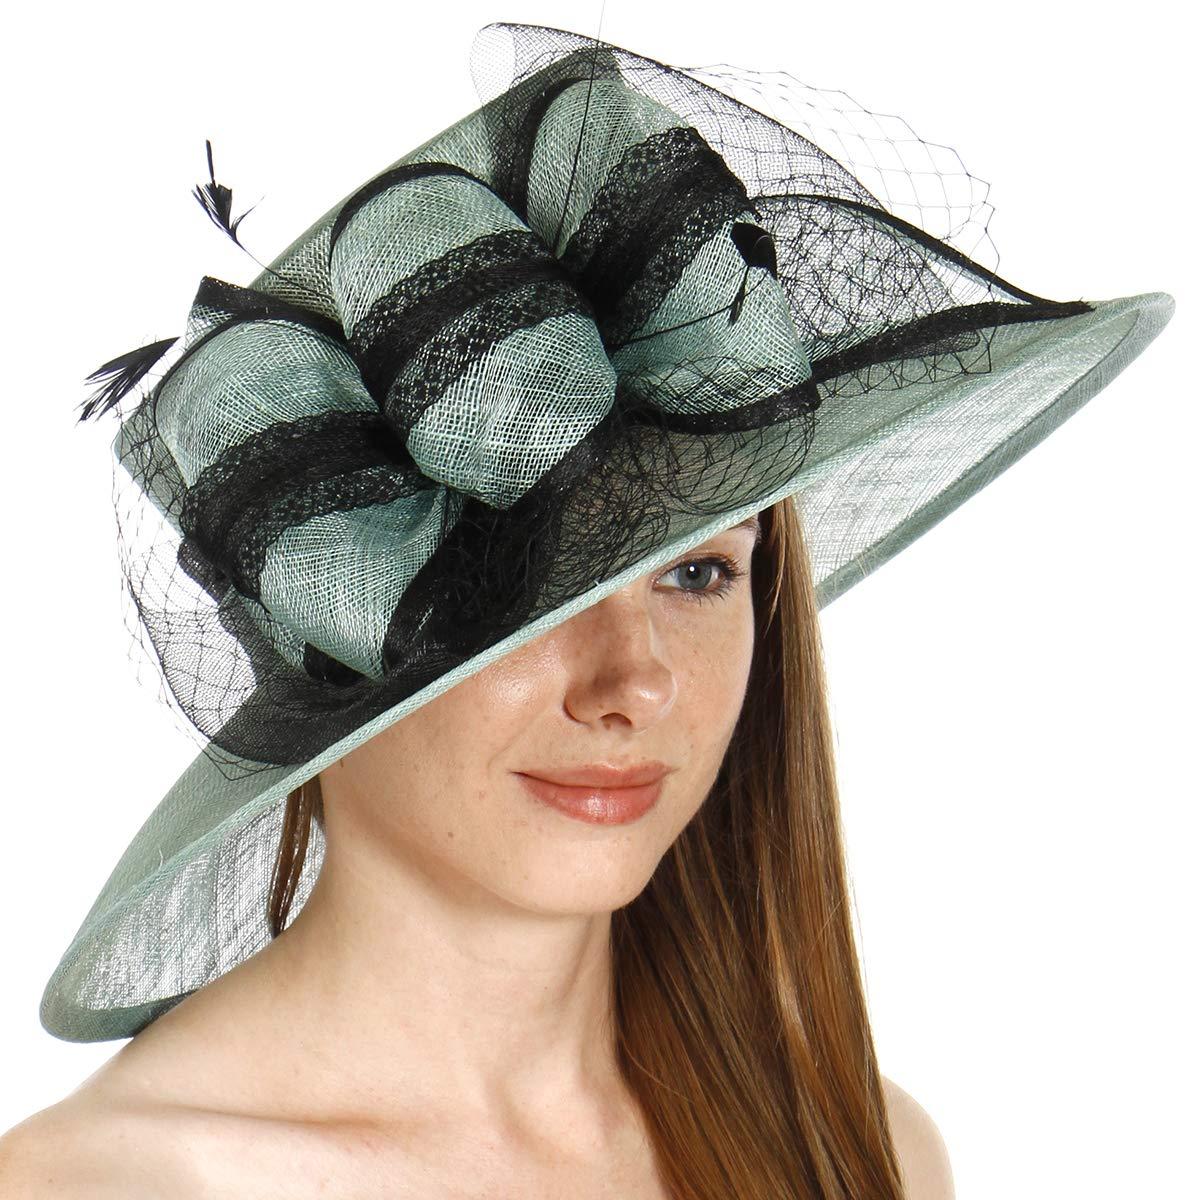 Dress Derby hat Women, for Church Party Kentucky Bridal Wedding Cocktail, Wide Brim Flower Cloche Bucket, Mint 2